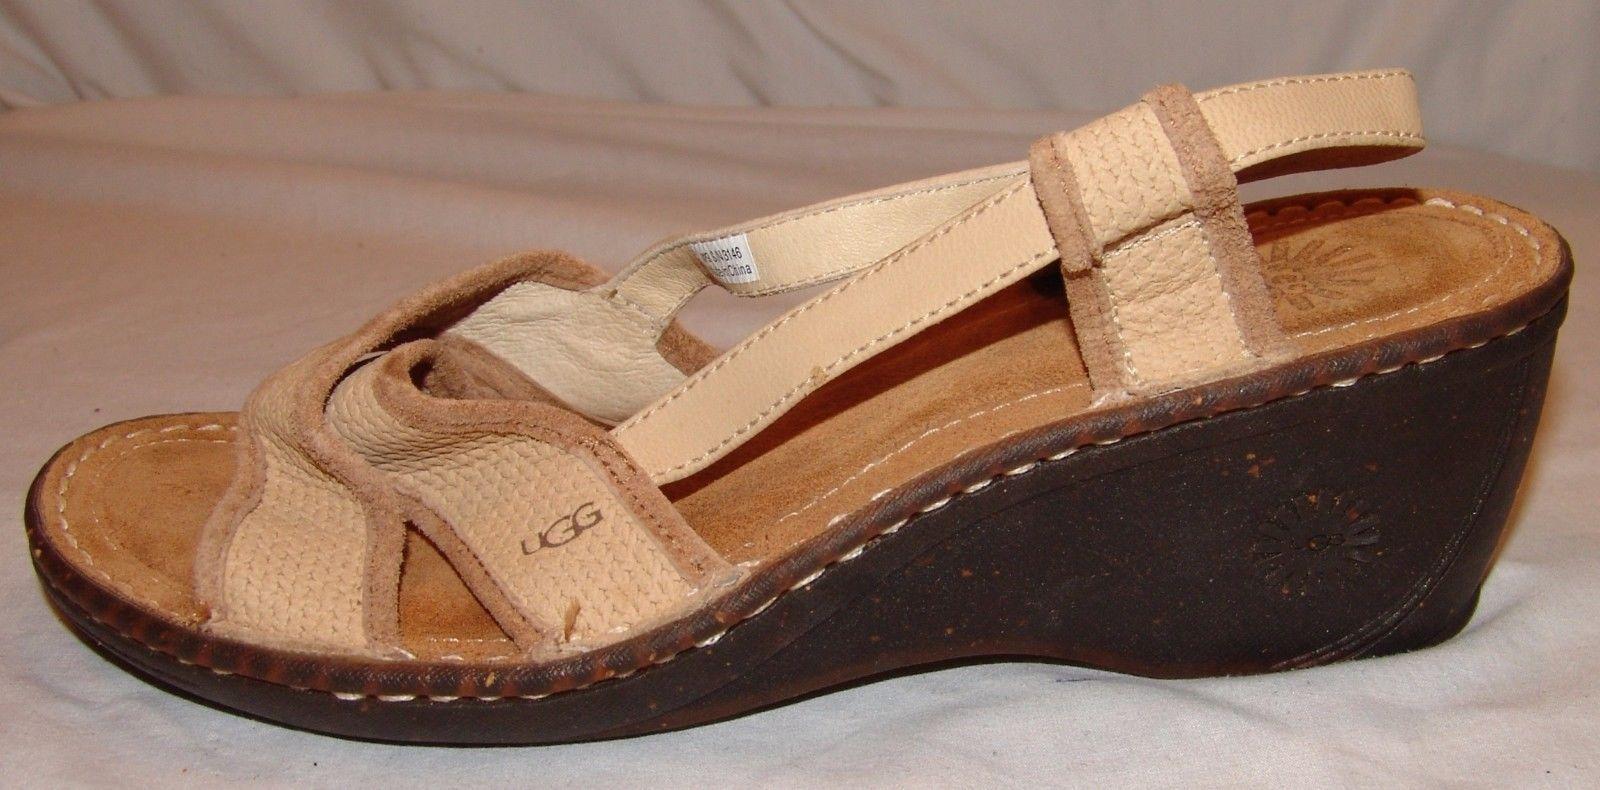 9d7667682cf Ugg Australia Wedge Heel Sandals Womens 9 and 50 similar items